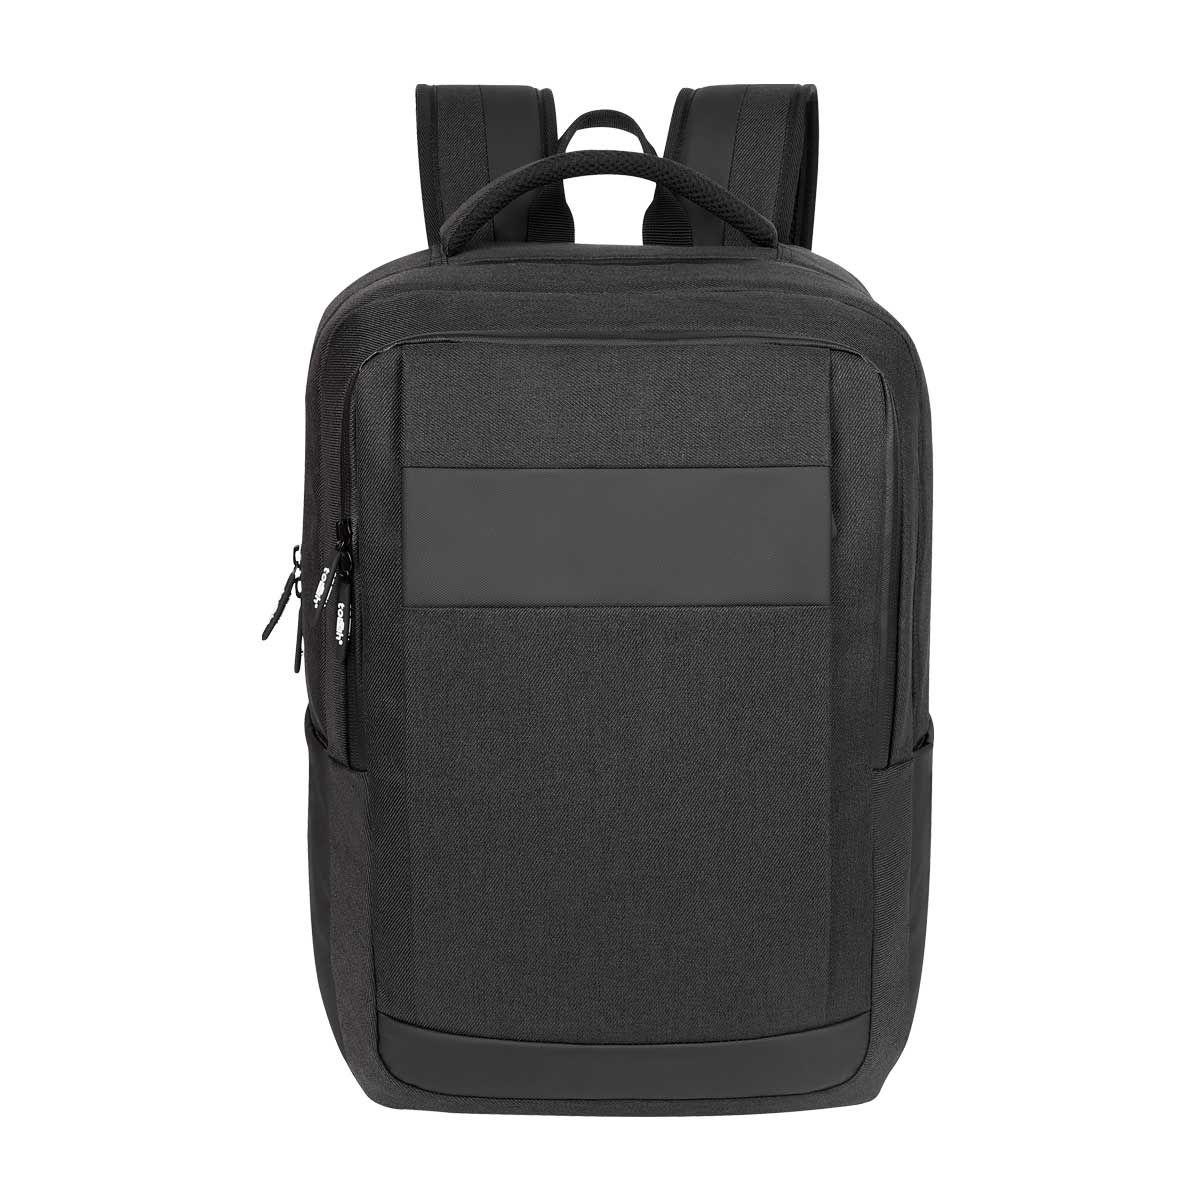 Mochila backpack Oxford AP-340